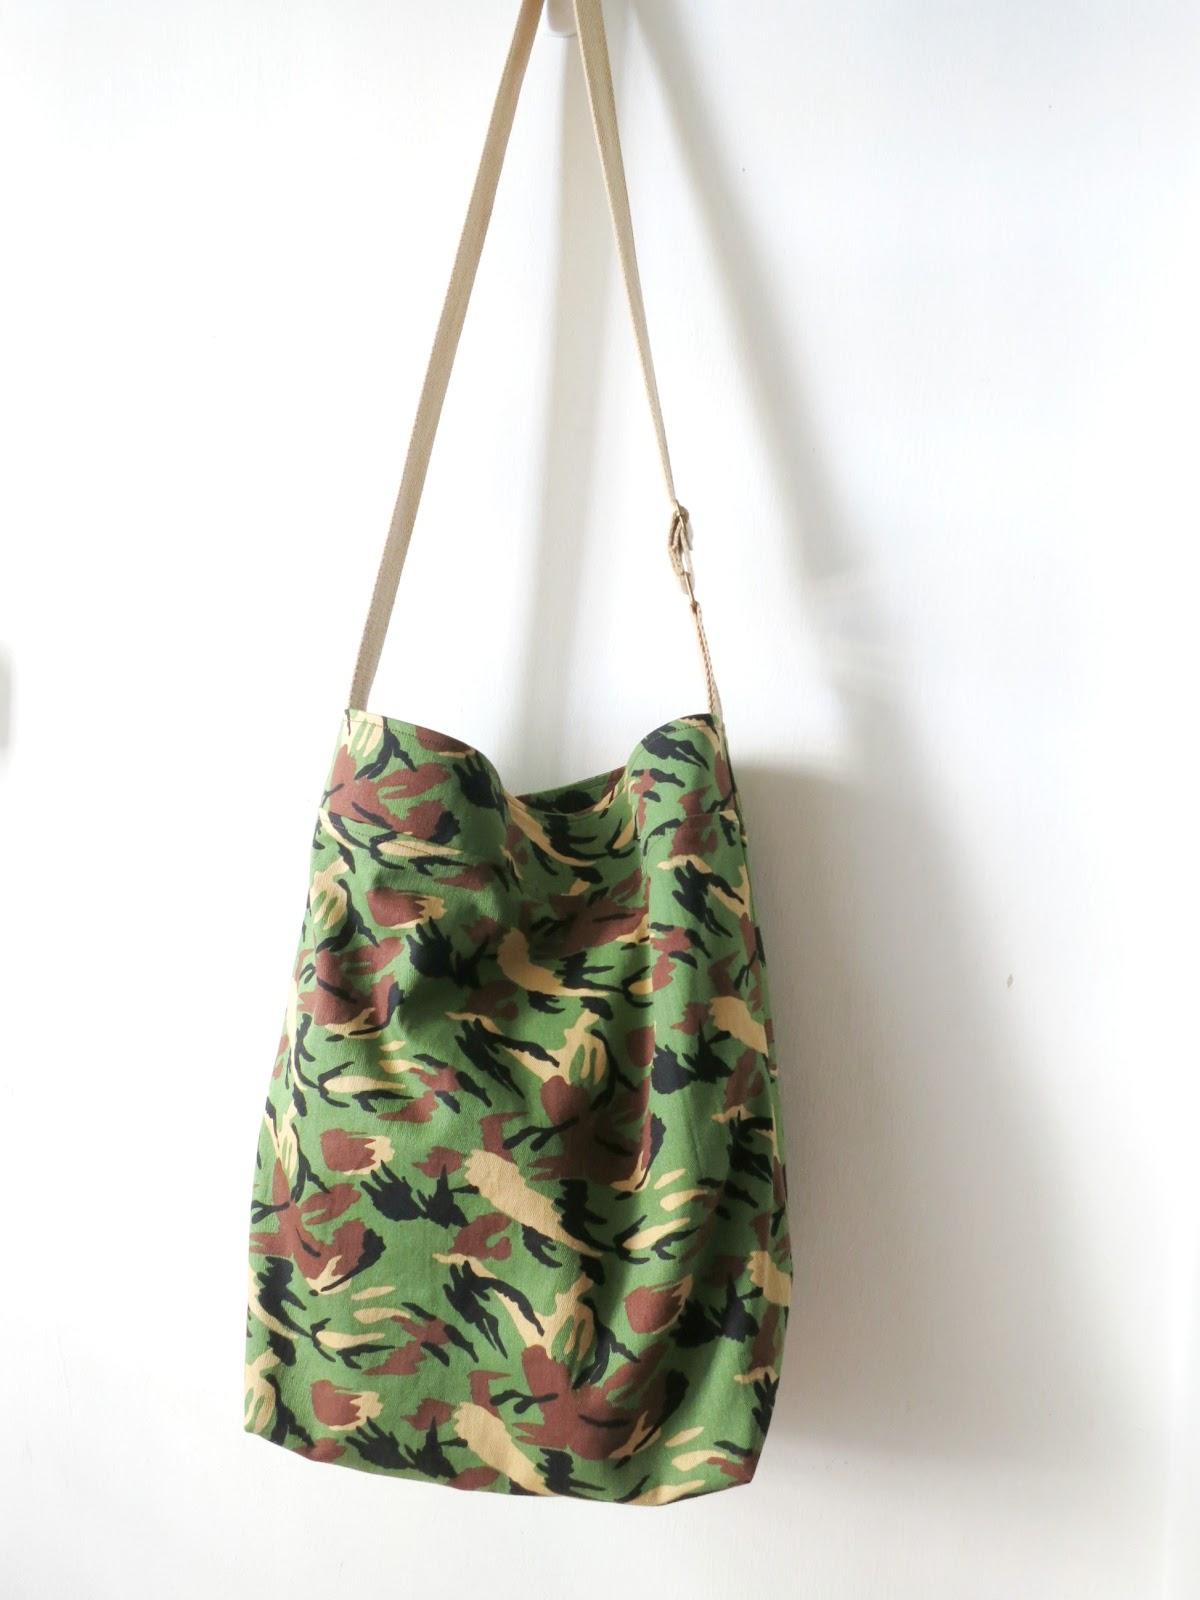 http://1.bp.blogspot.com/-n5mUXdsHtVc/T8dHh_D0e0I/AAAAAAAAGU8/jliOTJKnFDo/s1600/sling+bag.jpg